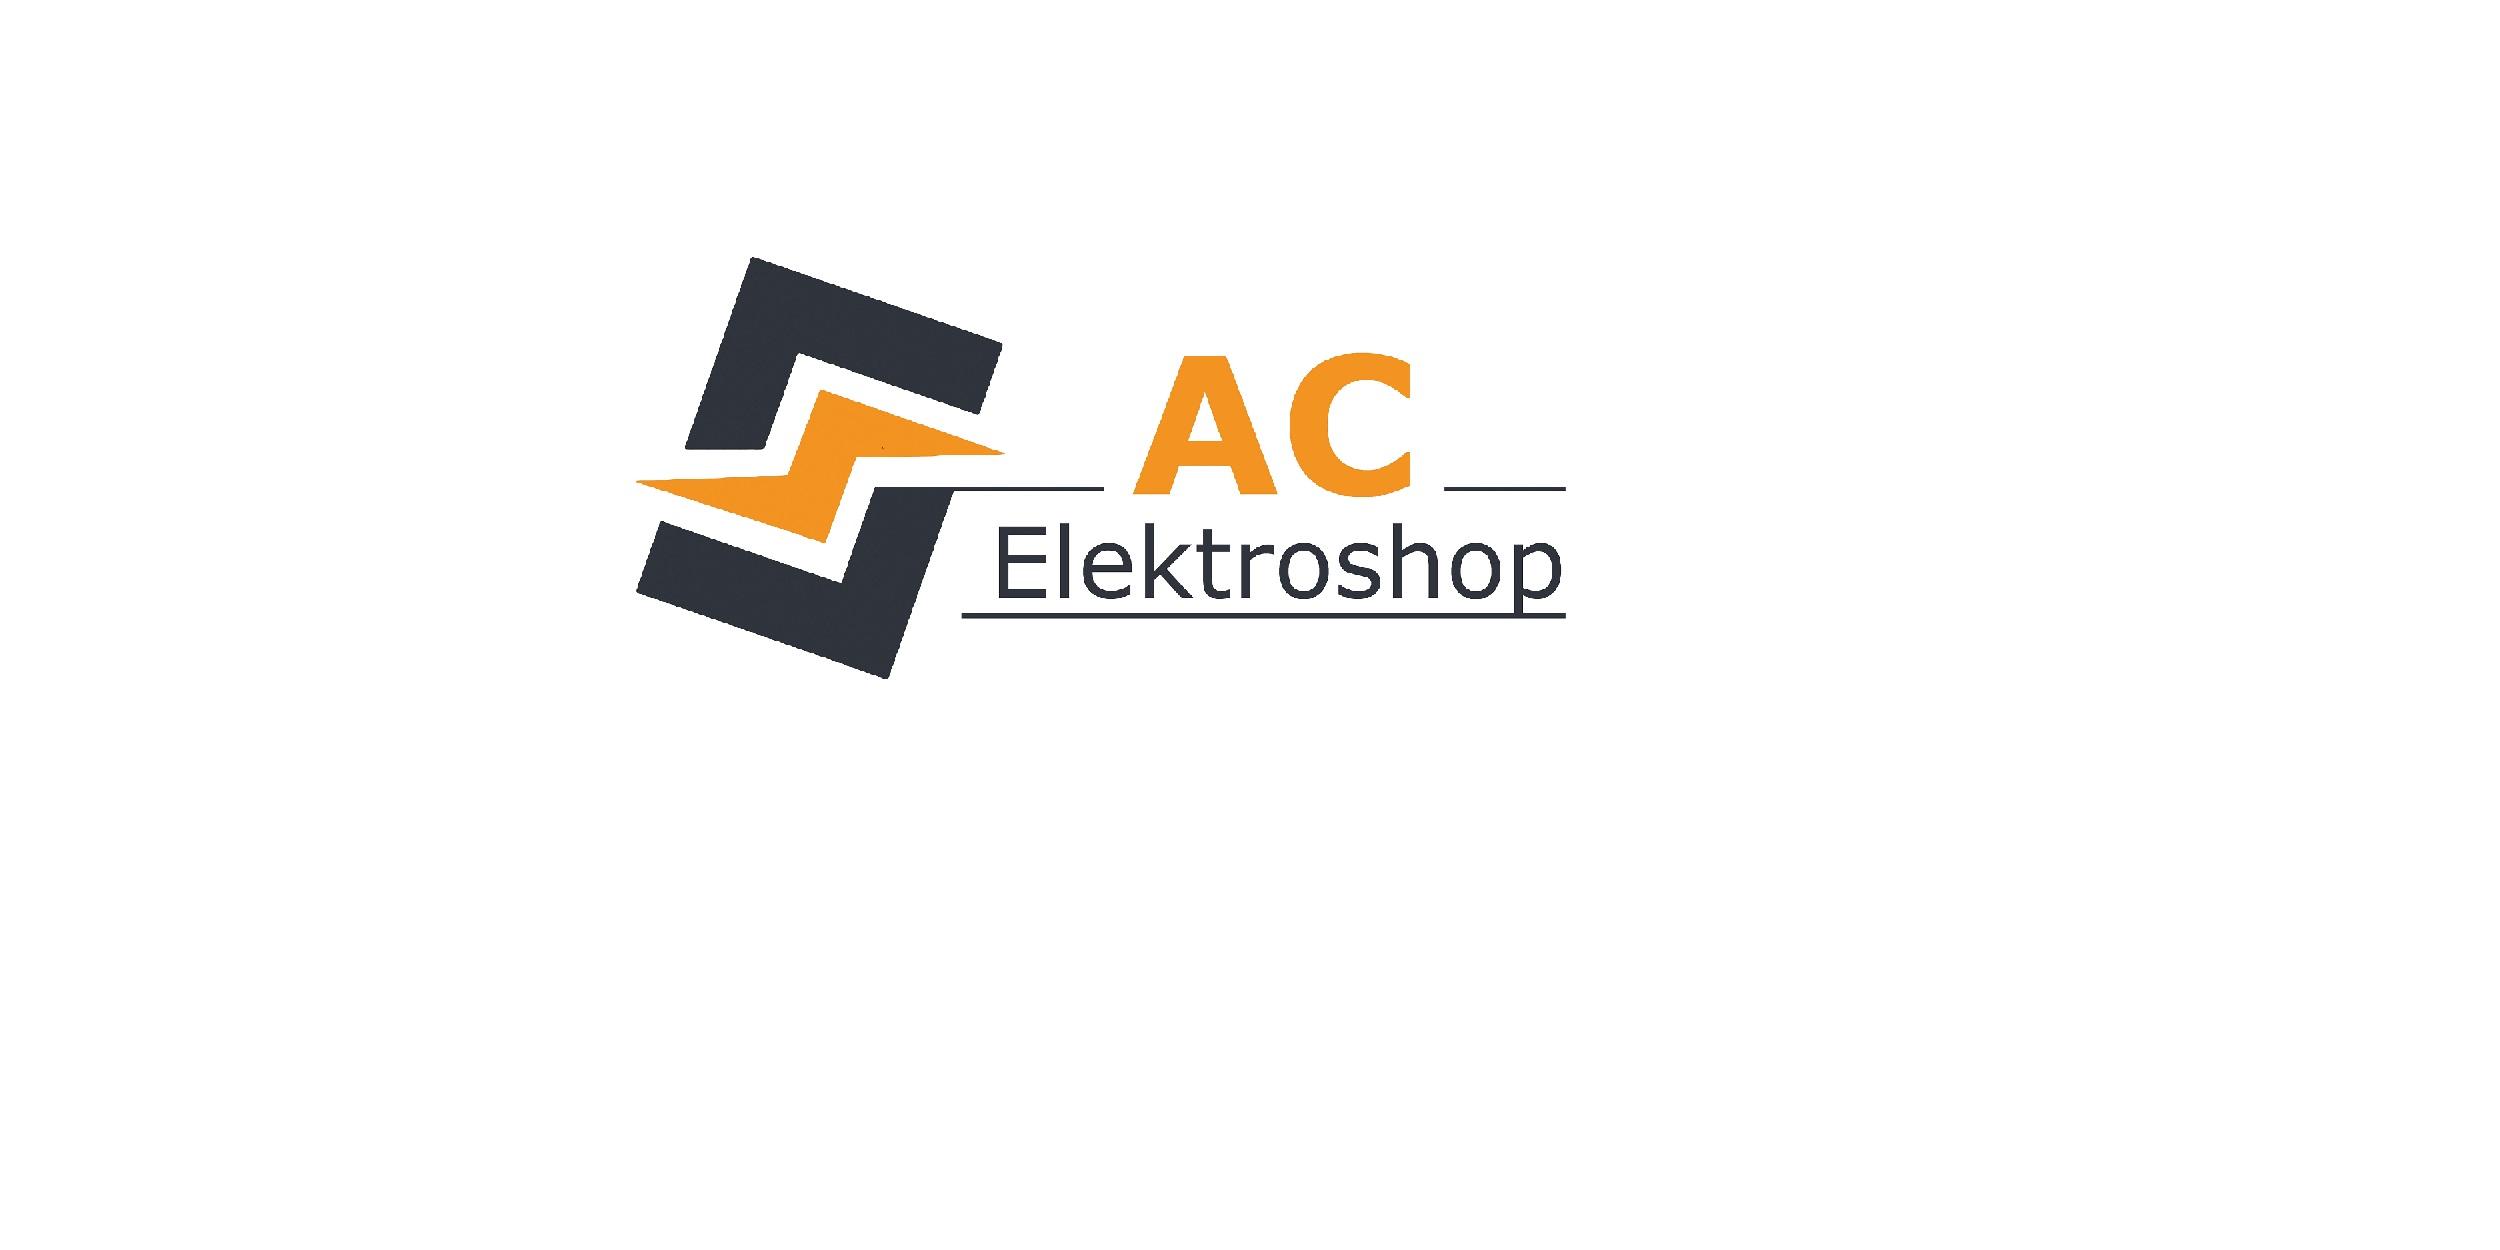 AC Elektroshop